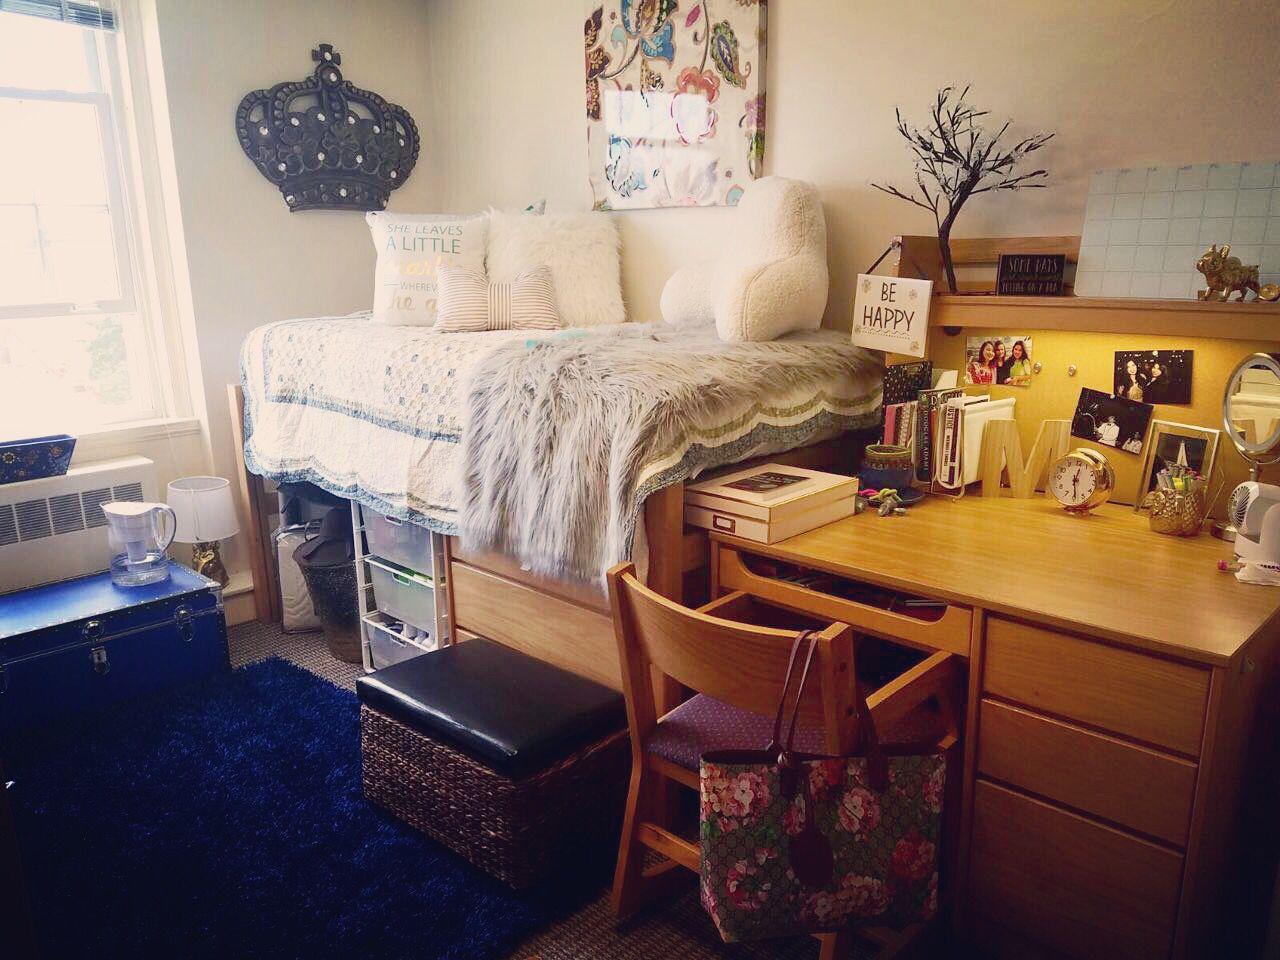 Wonderful My Daughters Dorm Room At Denison University Freshman 2016, Class Of 2020 Part 4